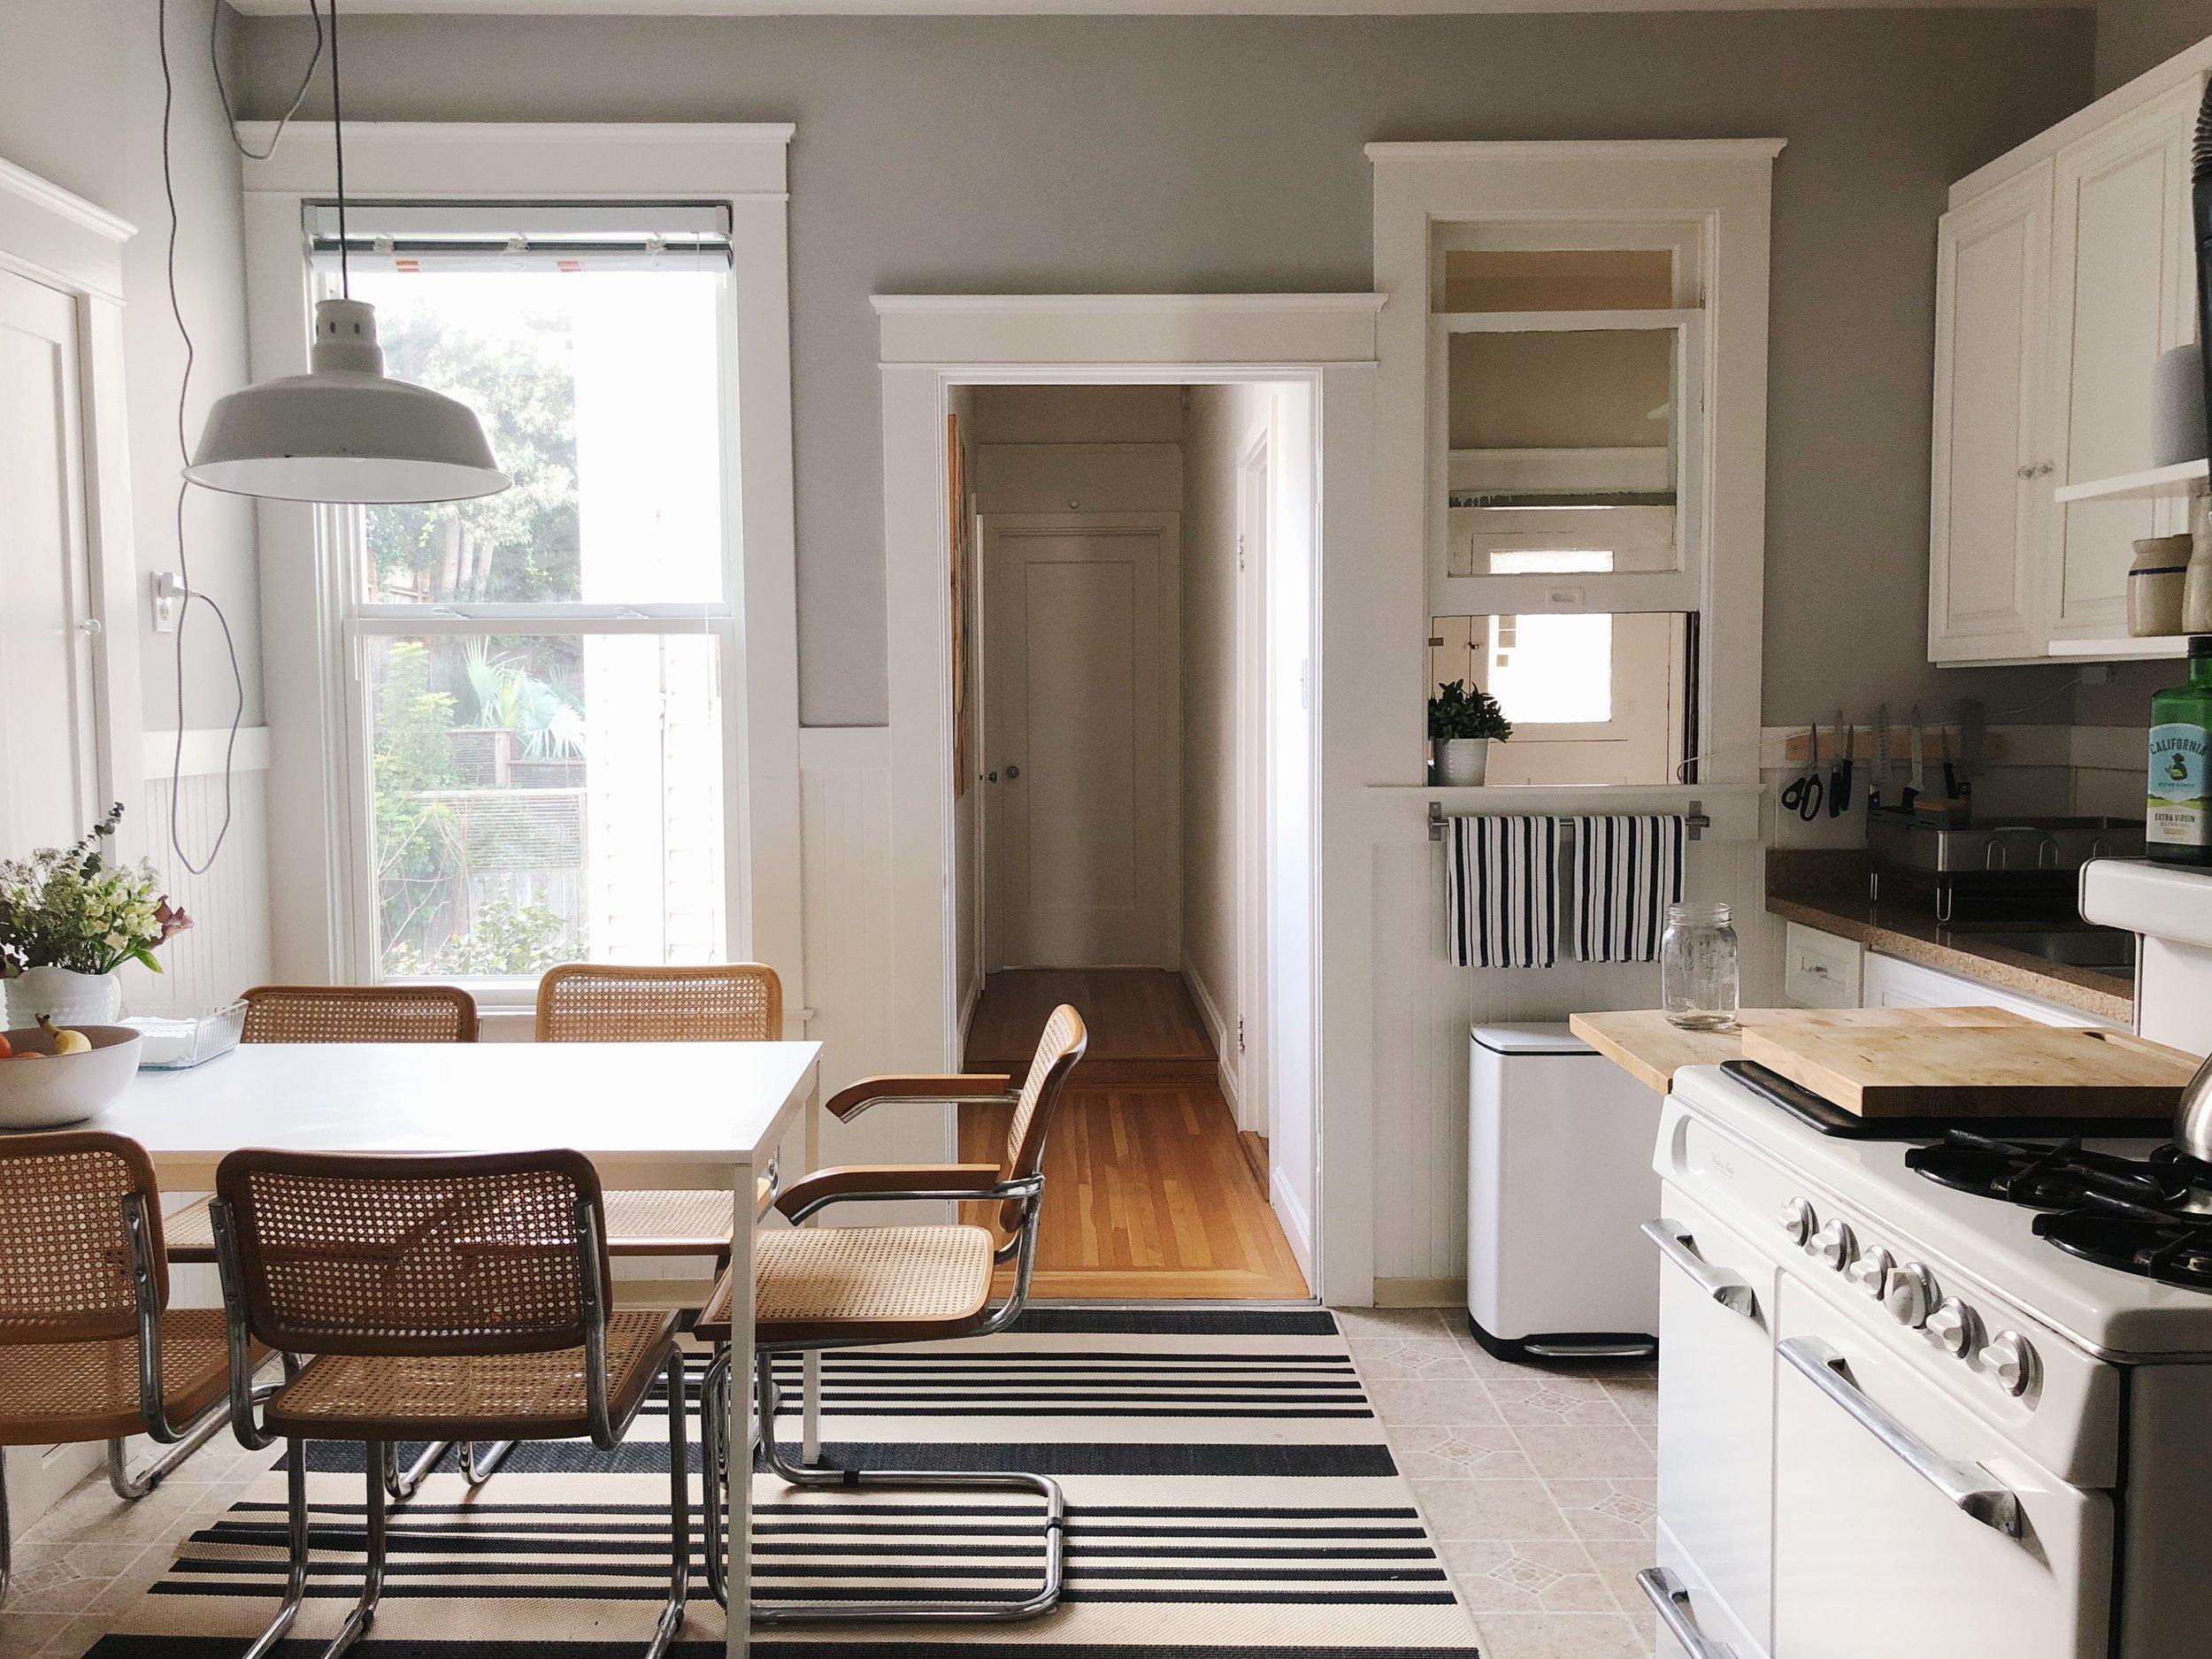 Table: Ikea. Chairs: Craigslist, similar via Amazon. Rug:  Amazon . Trash can:  Simple Human . Striped dish towels:  Wiliams Sonoma .